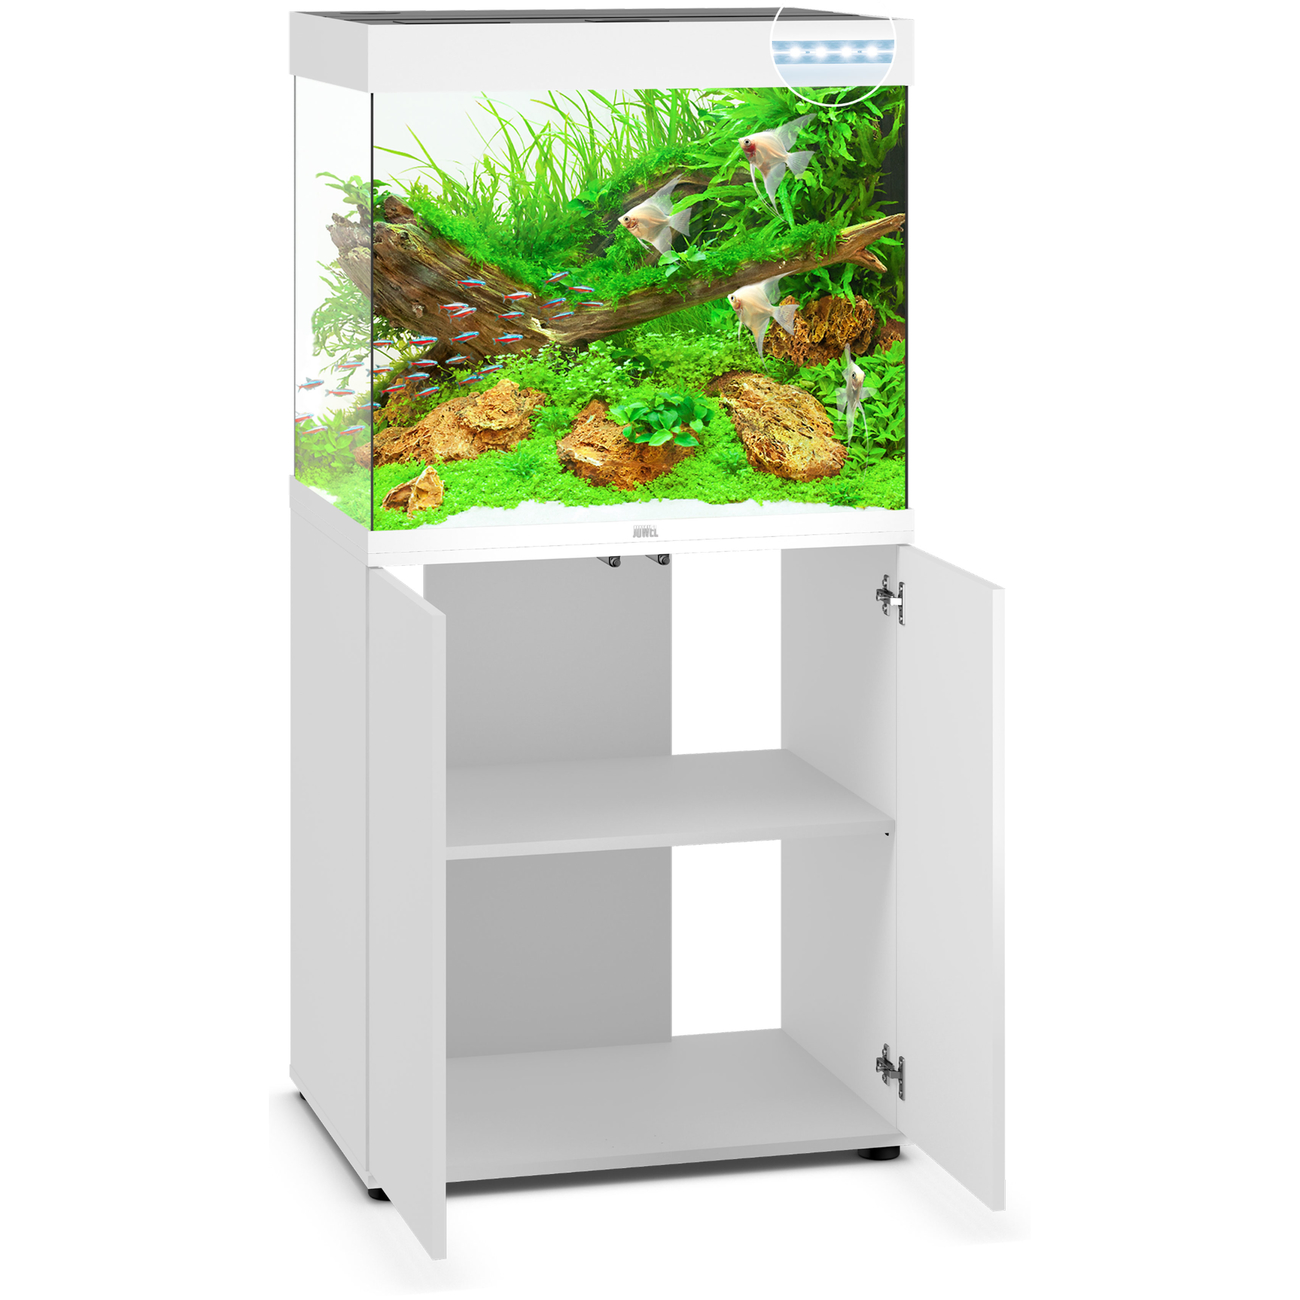 Juwel Lido 200 LED Aquarium mit Unterschrank, Bild 7